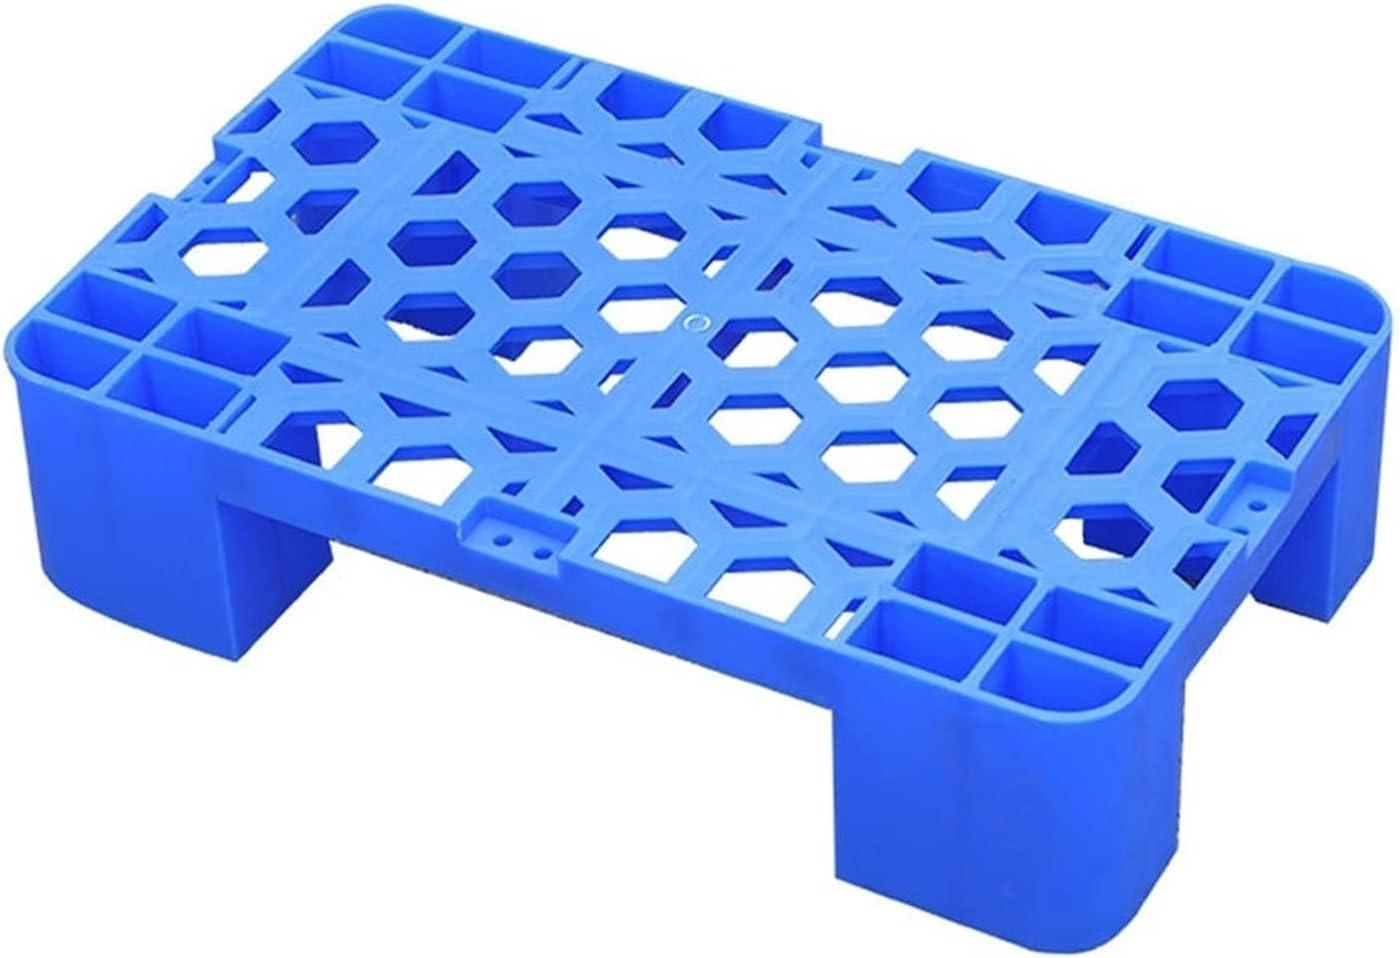 LIANGJUN Plastic Low price Pallets Storage Racks 100% quality warranty Waterproof Grid M Sturdy